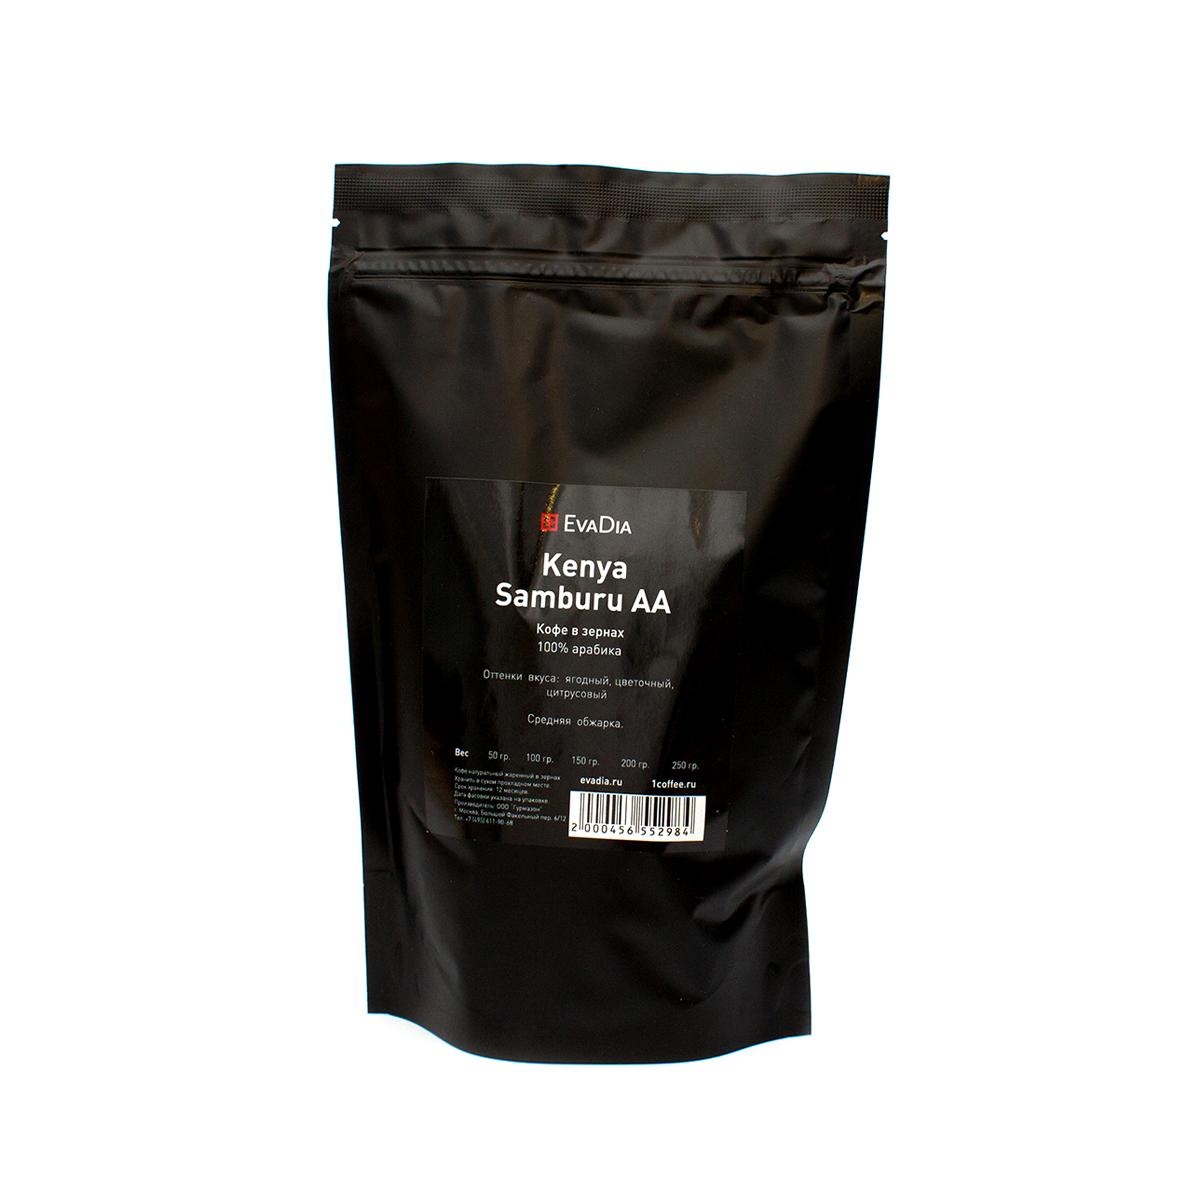 Кофе EvaDia Кения Самбуру АА (Kenya Samburu АА), 250 грамм